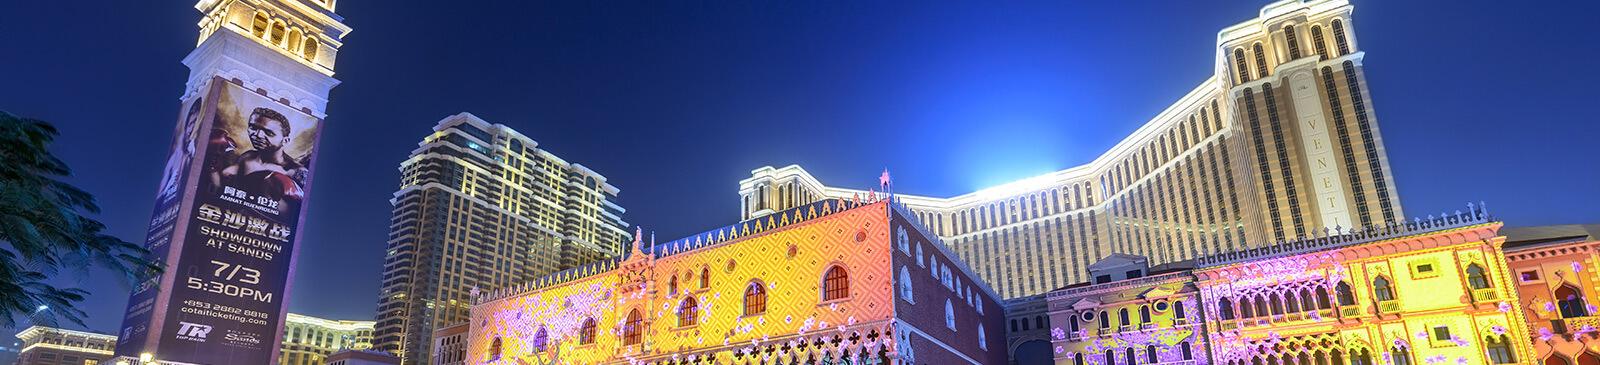 Venetian Palazzo CS